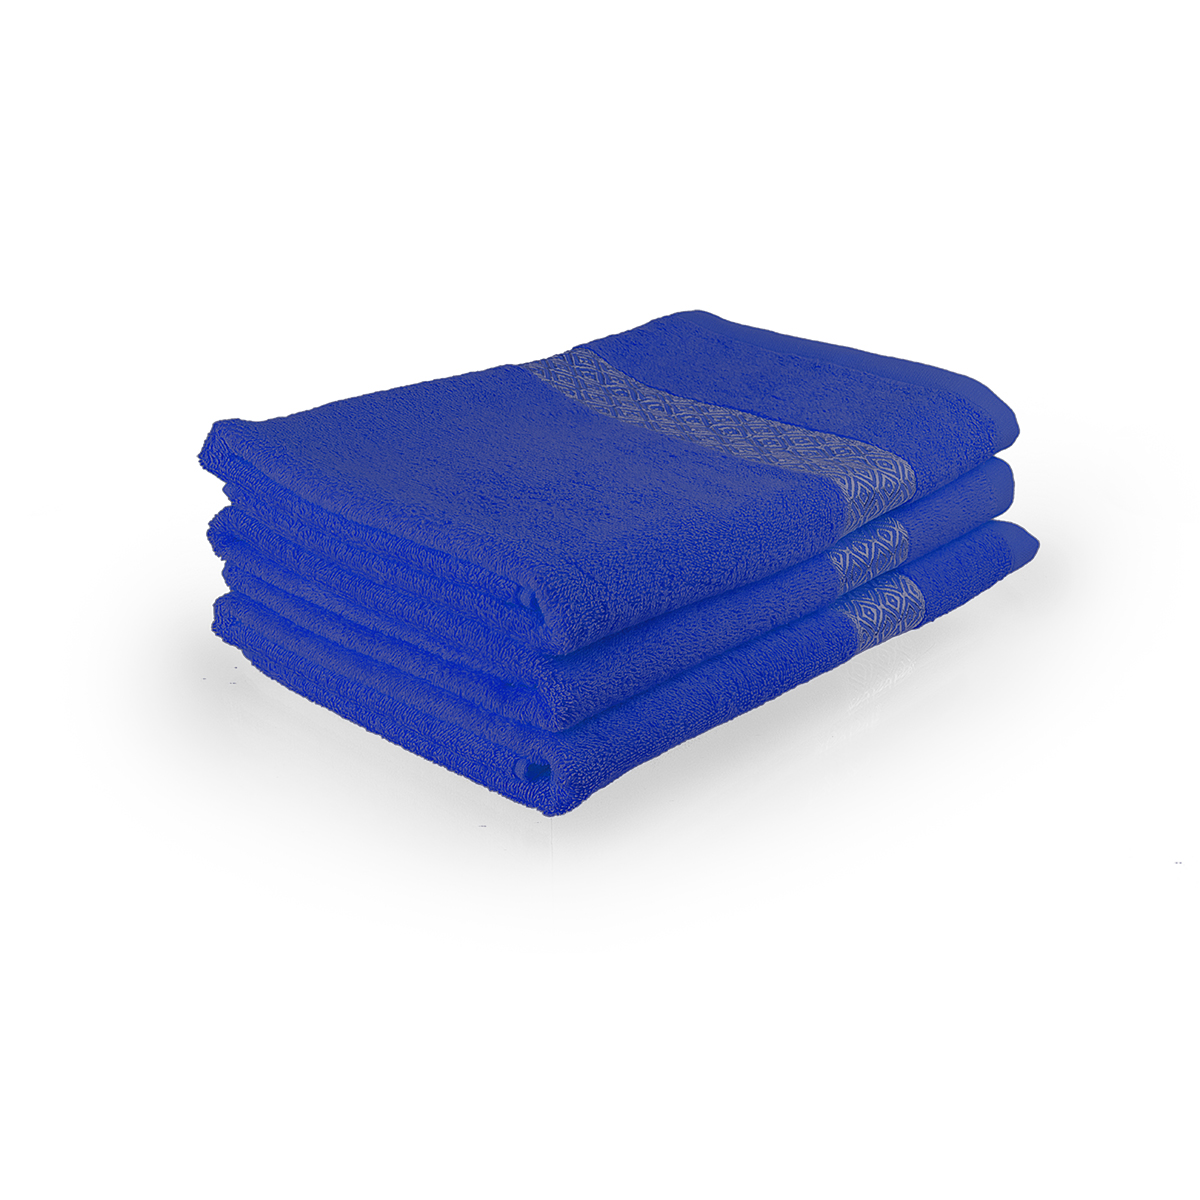 Полотенце Серебро Синий, размер 34х78 смМахровые полотенца<br>Плотность ткани:360 г/кв. м.<br><br>Тип: Полотенце<br>Размер: 34х78<br>Материал: Махра